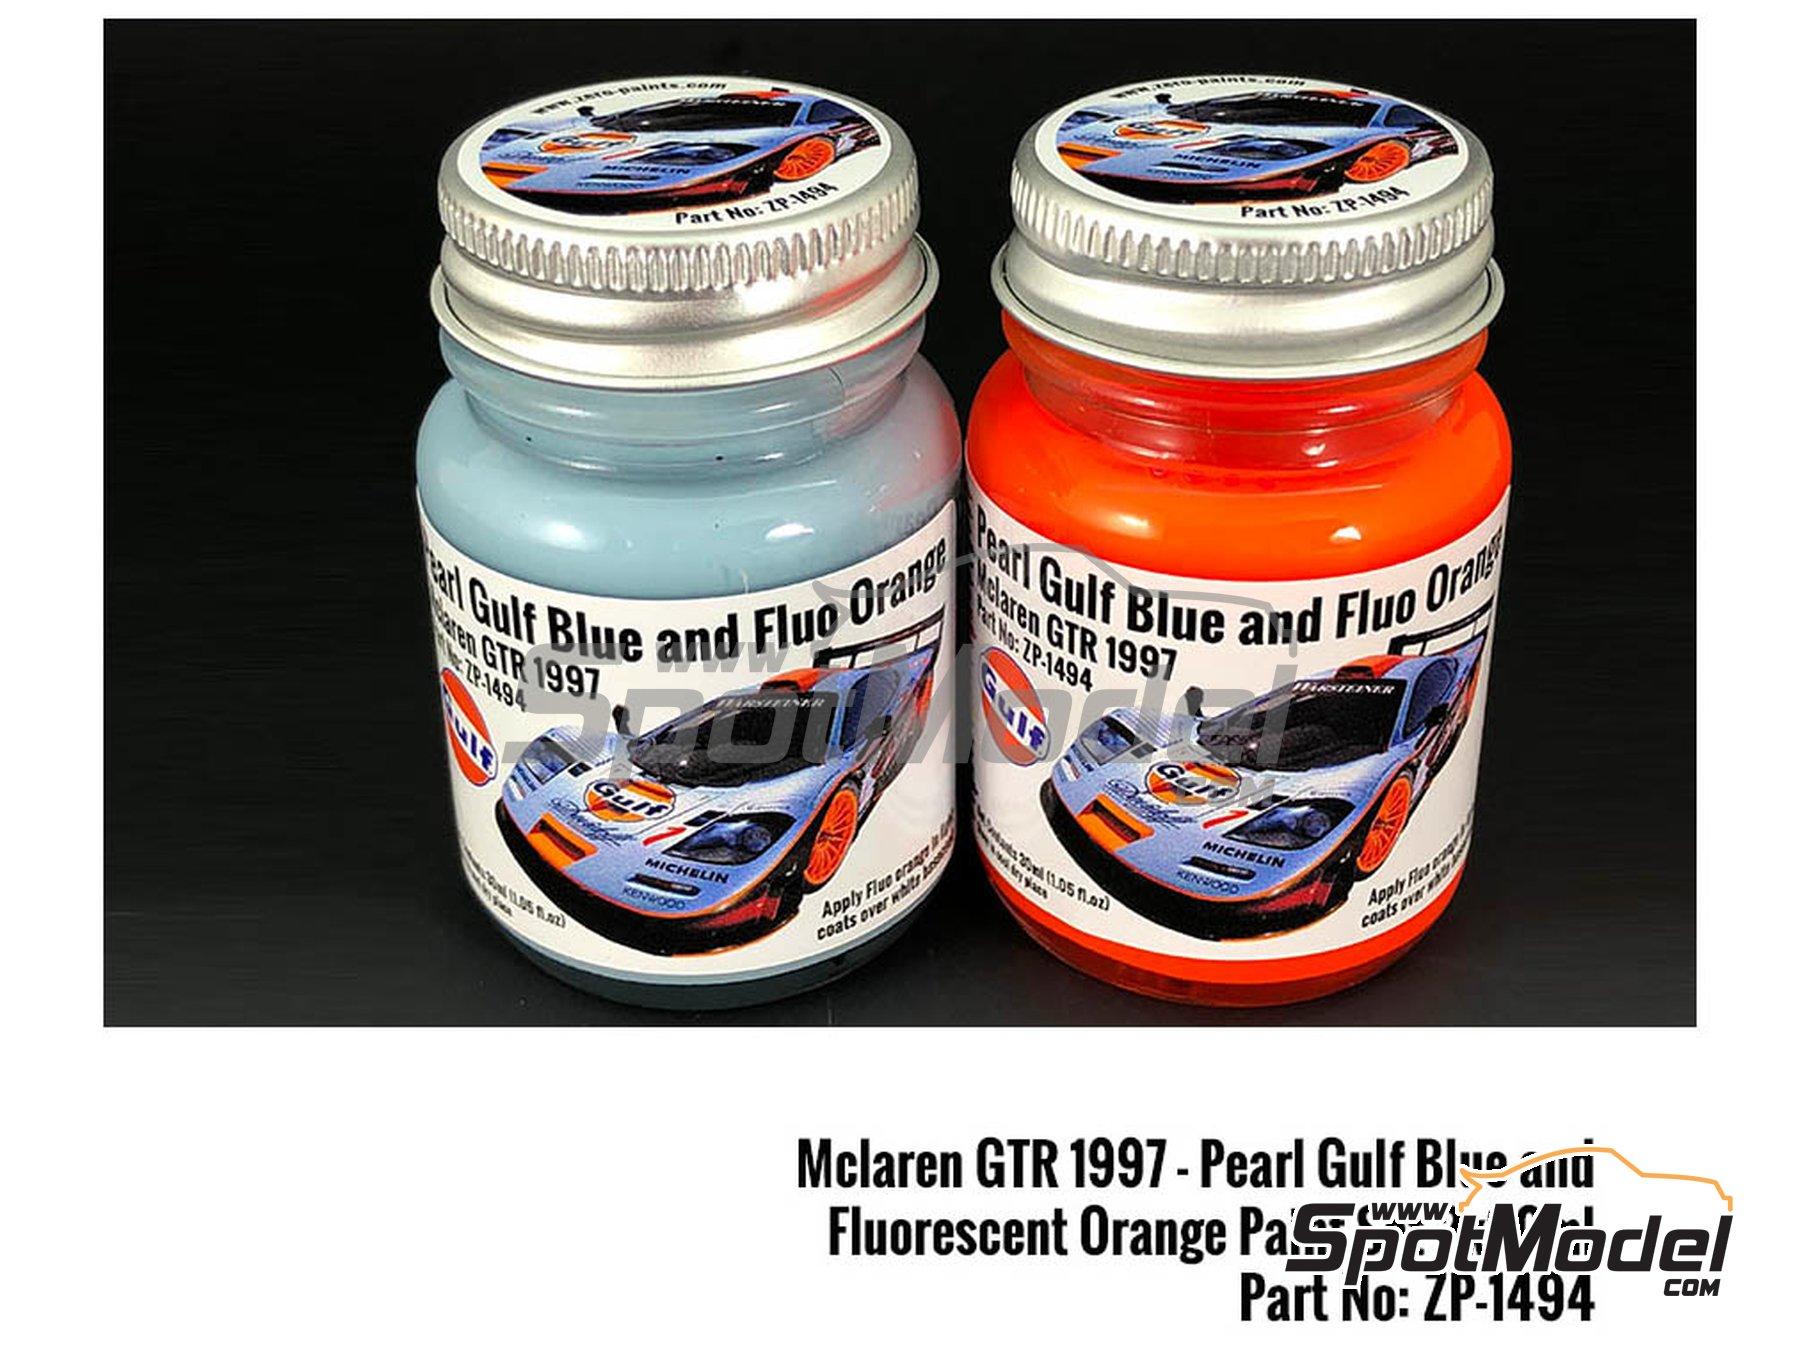 Image 1: Azul perlado y naranja fluorescente 1997 McLaren F1 GTR con decoración Gulf - 2 x 30ml   Set de pinturas fabricado por Zero Paints (ref.ZP-1494)